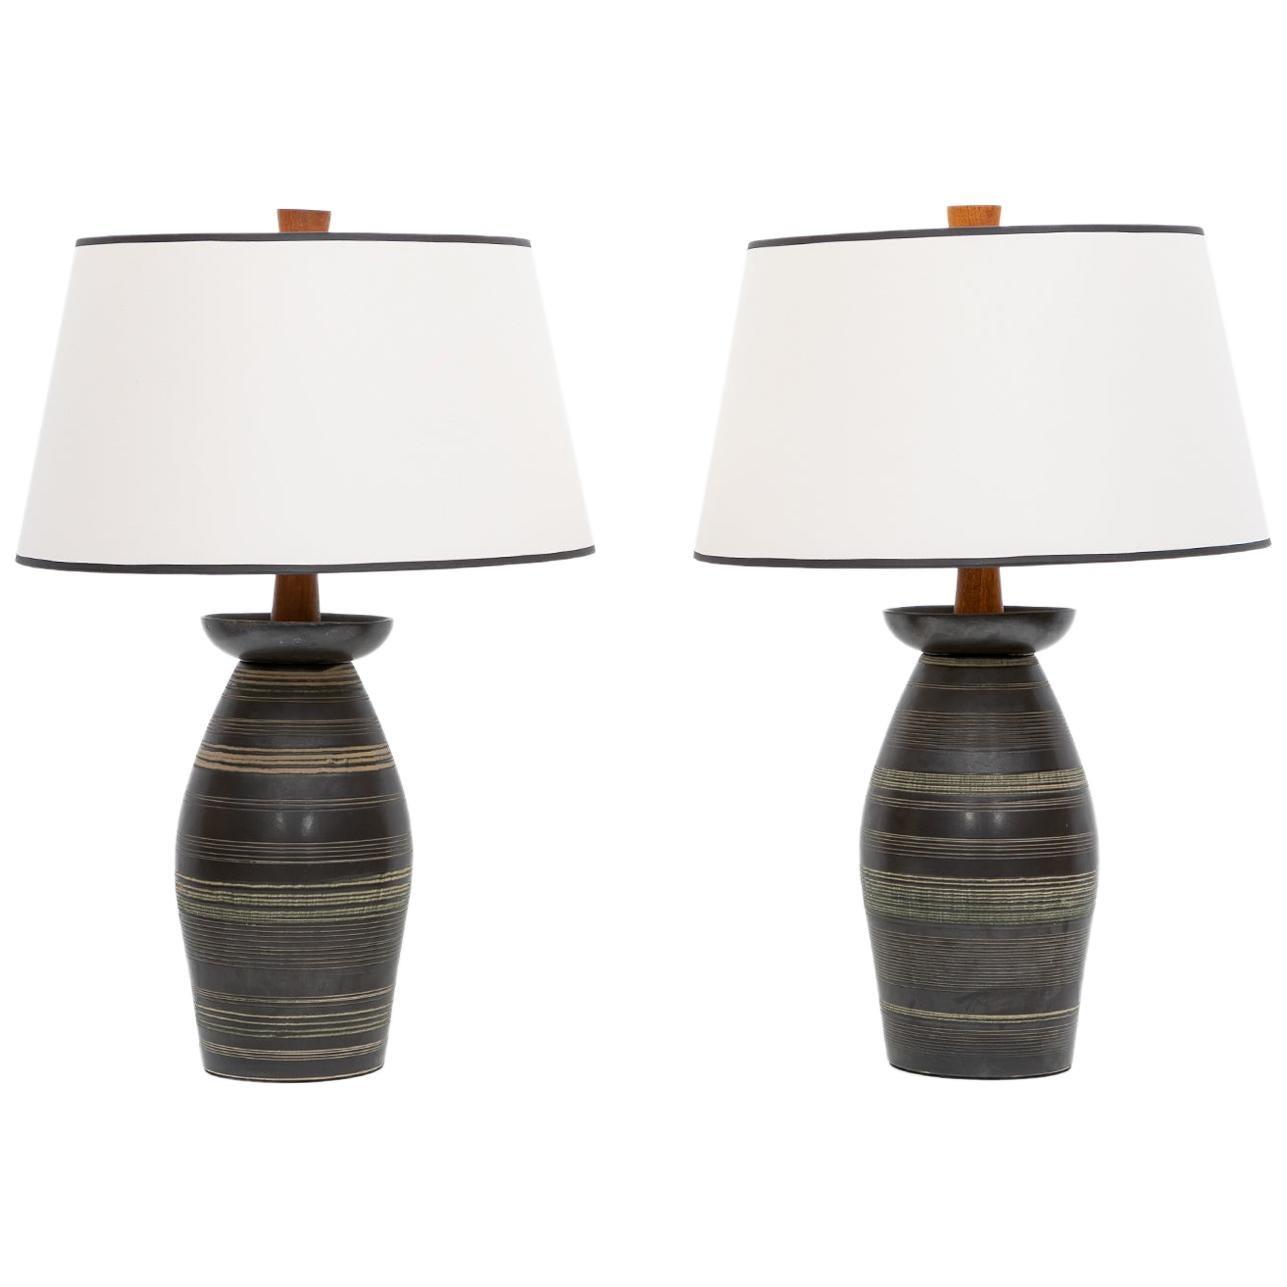 1950s Dark Brown Ceramic Pair of Table Lamp by Jane & Gordon Martz 'B'